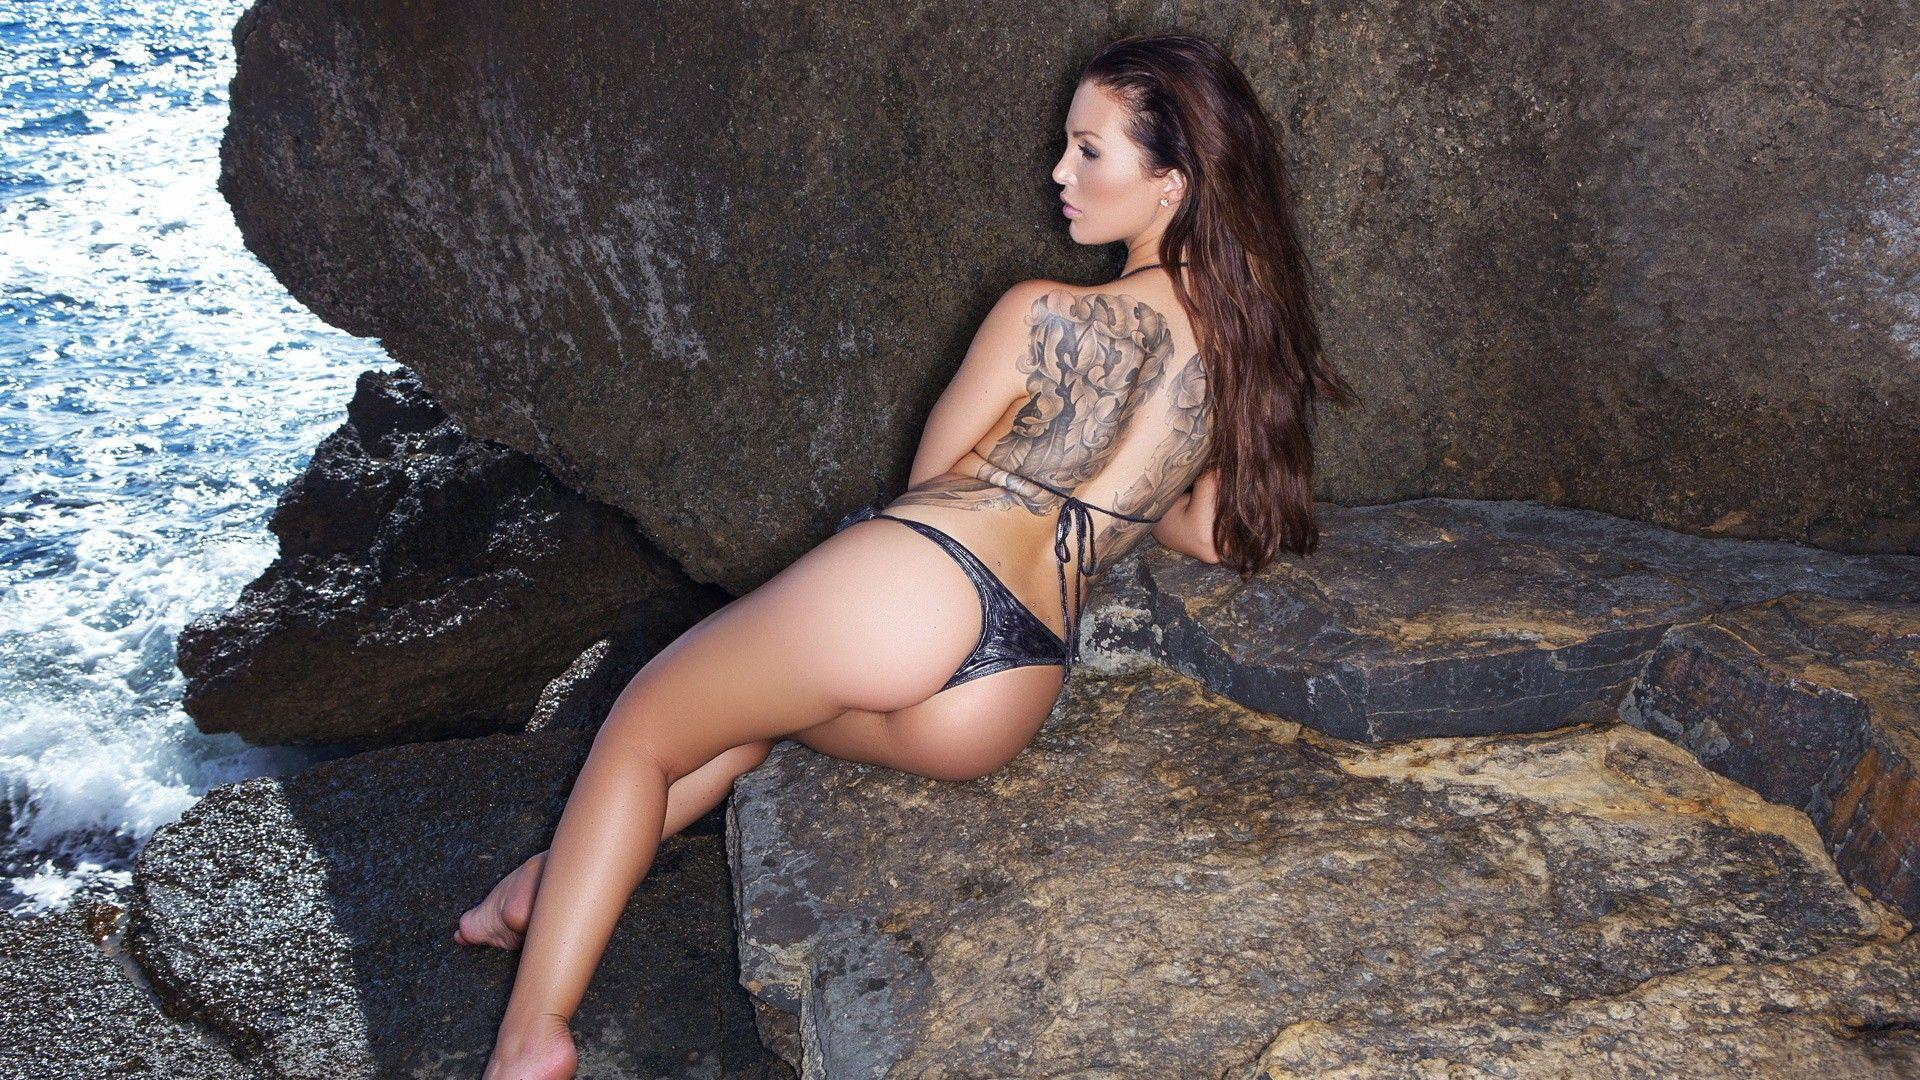 ICloud Rihana naked (26 photo), Tits, Leaked, Feet, legs 2019